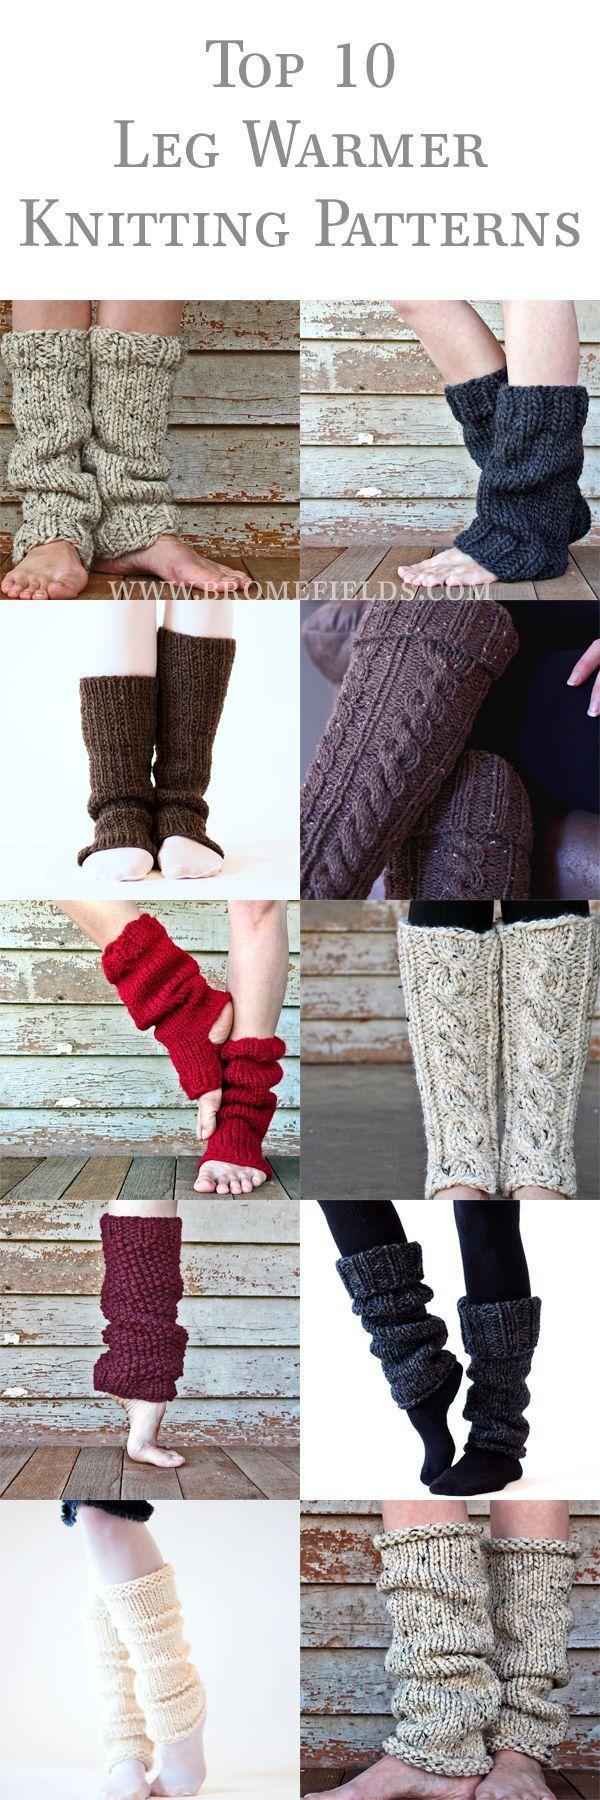 102 best boot cuffs leg warmers knitting patterns images on top 10 leg warmer knitting patterns by brome fields bankloansurffo Choice Image